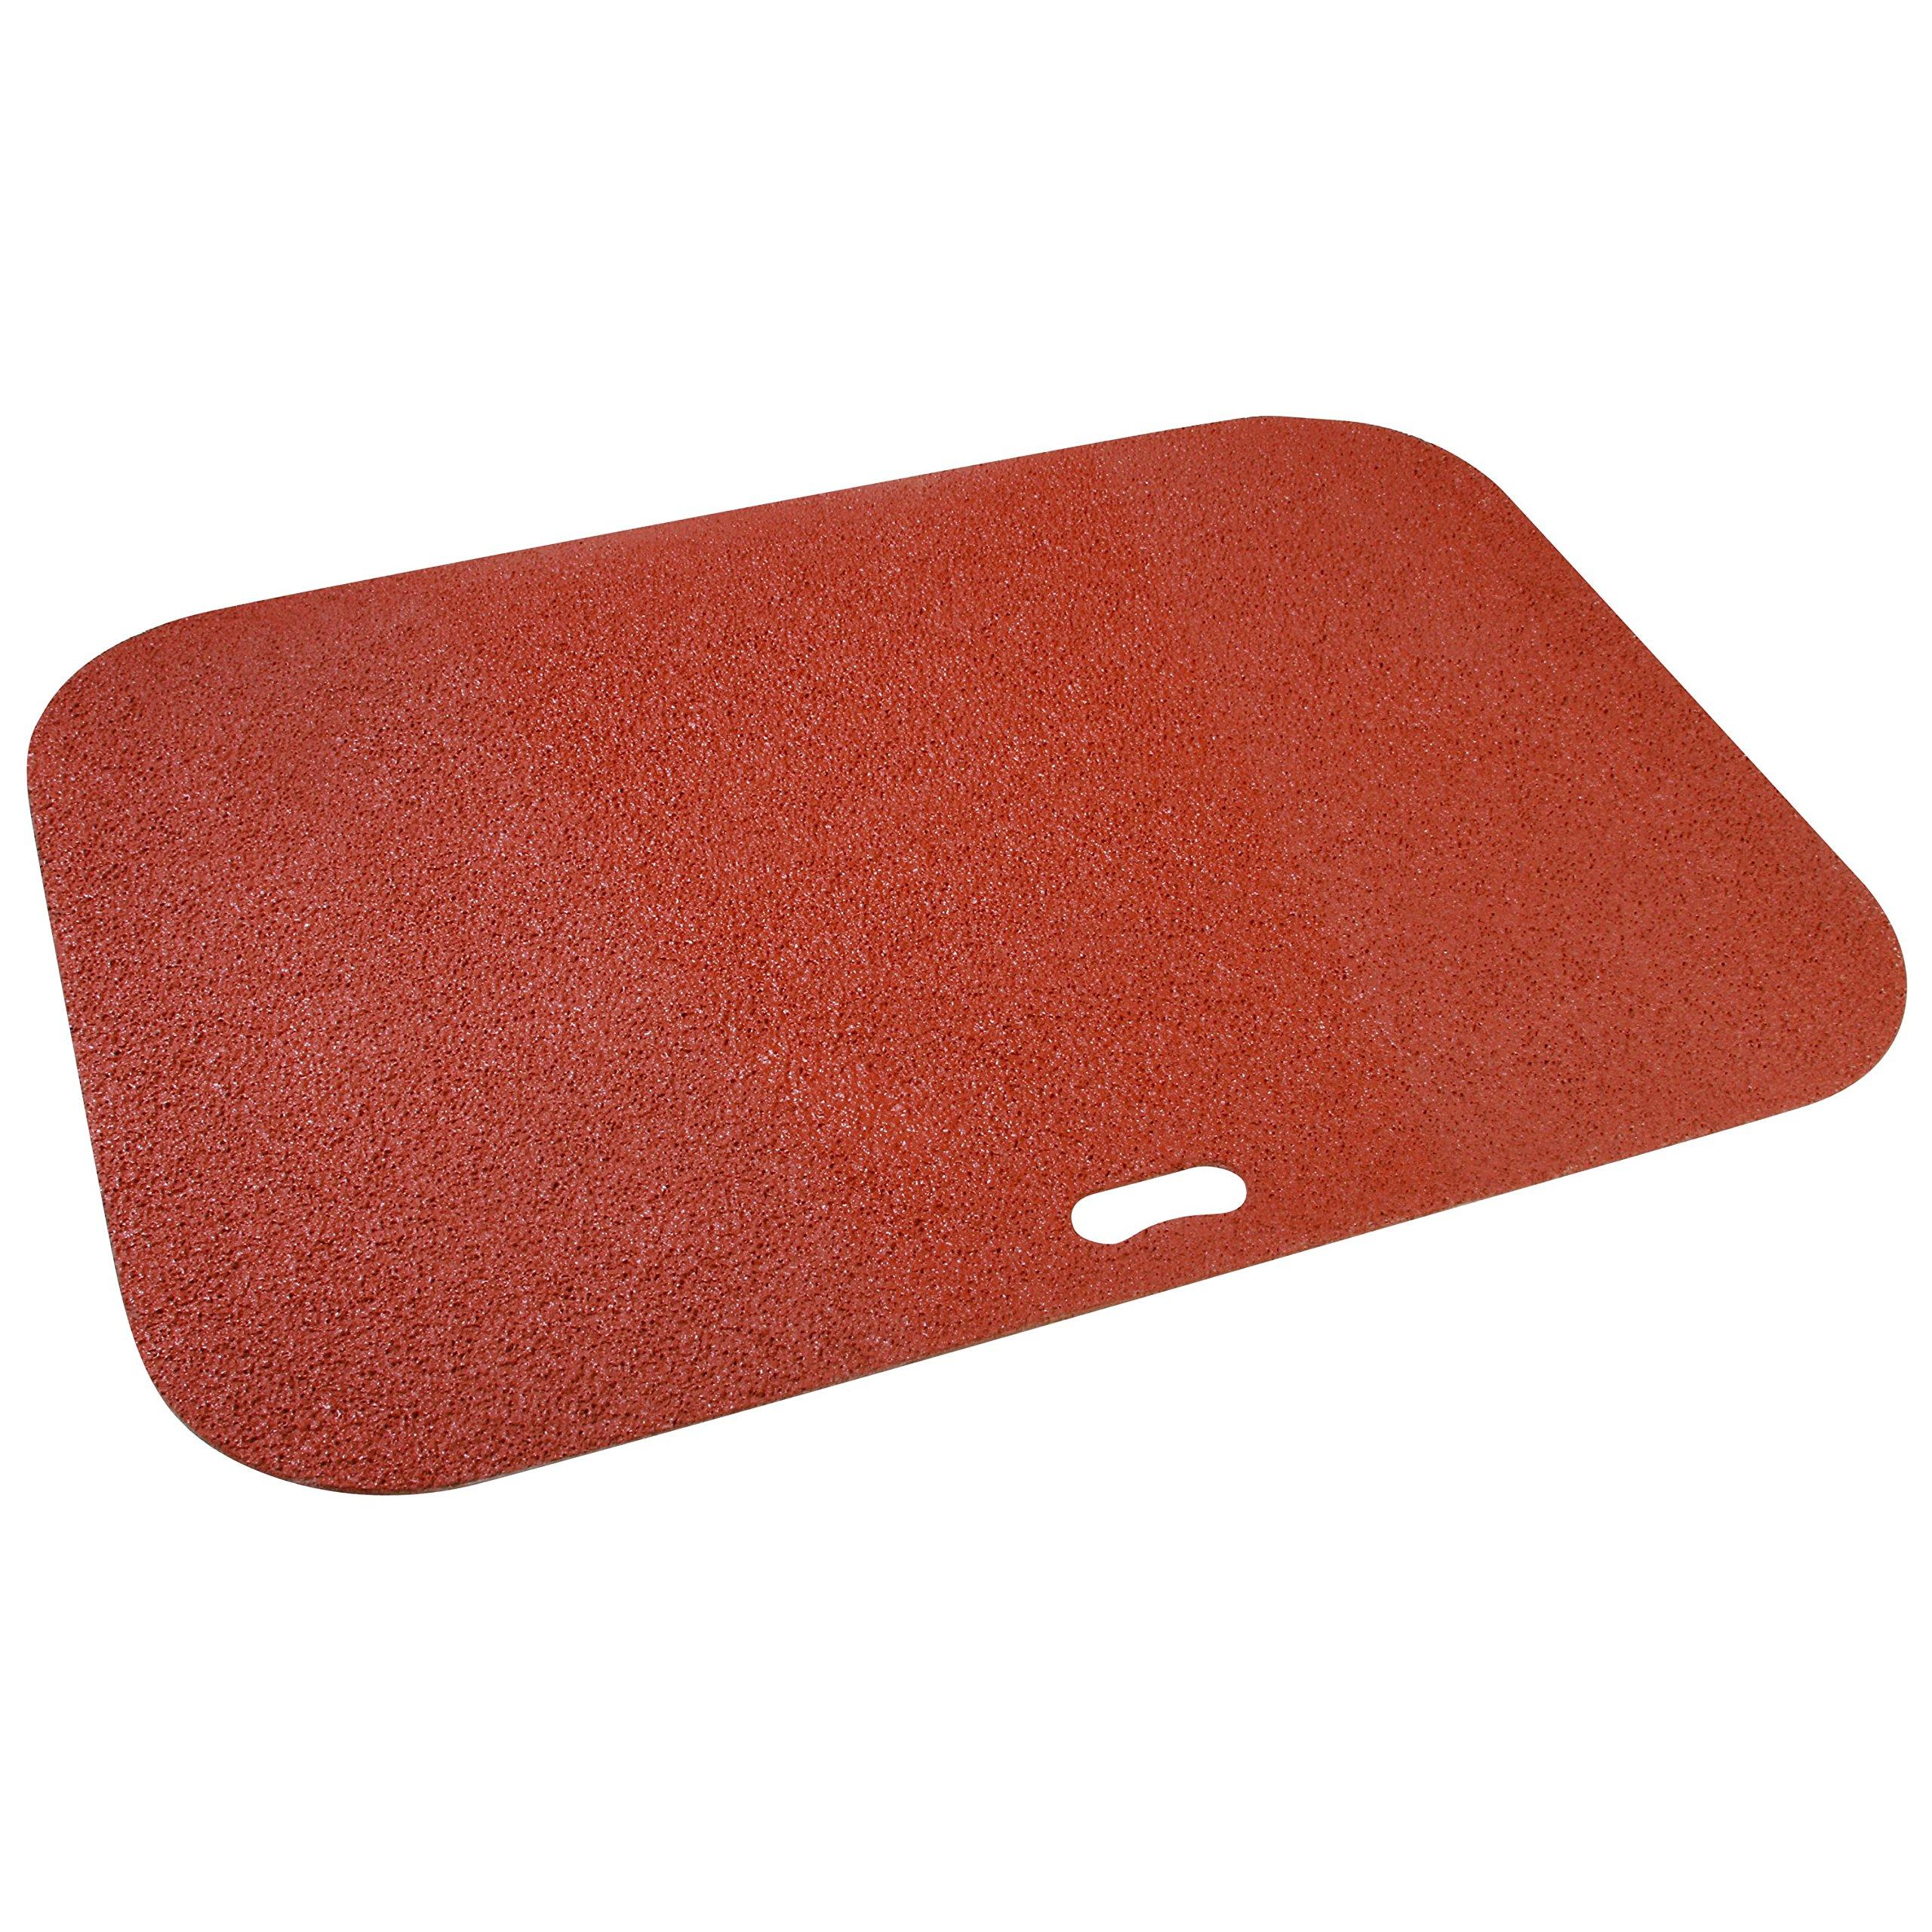 The Original Grill Pad Brick Grill Pad, Rectangle